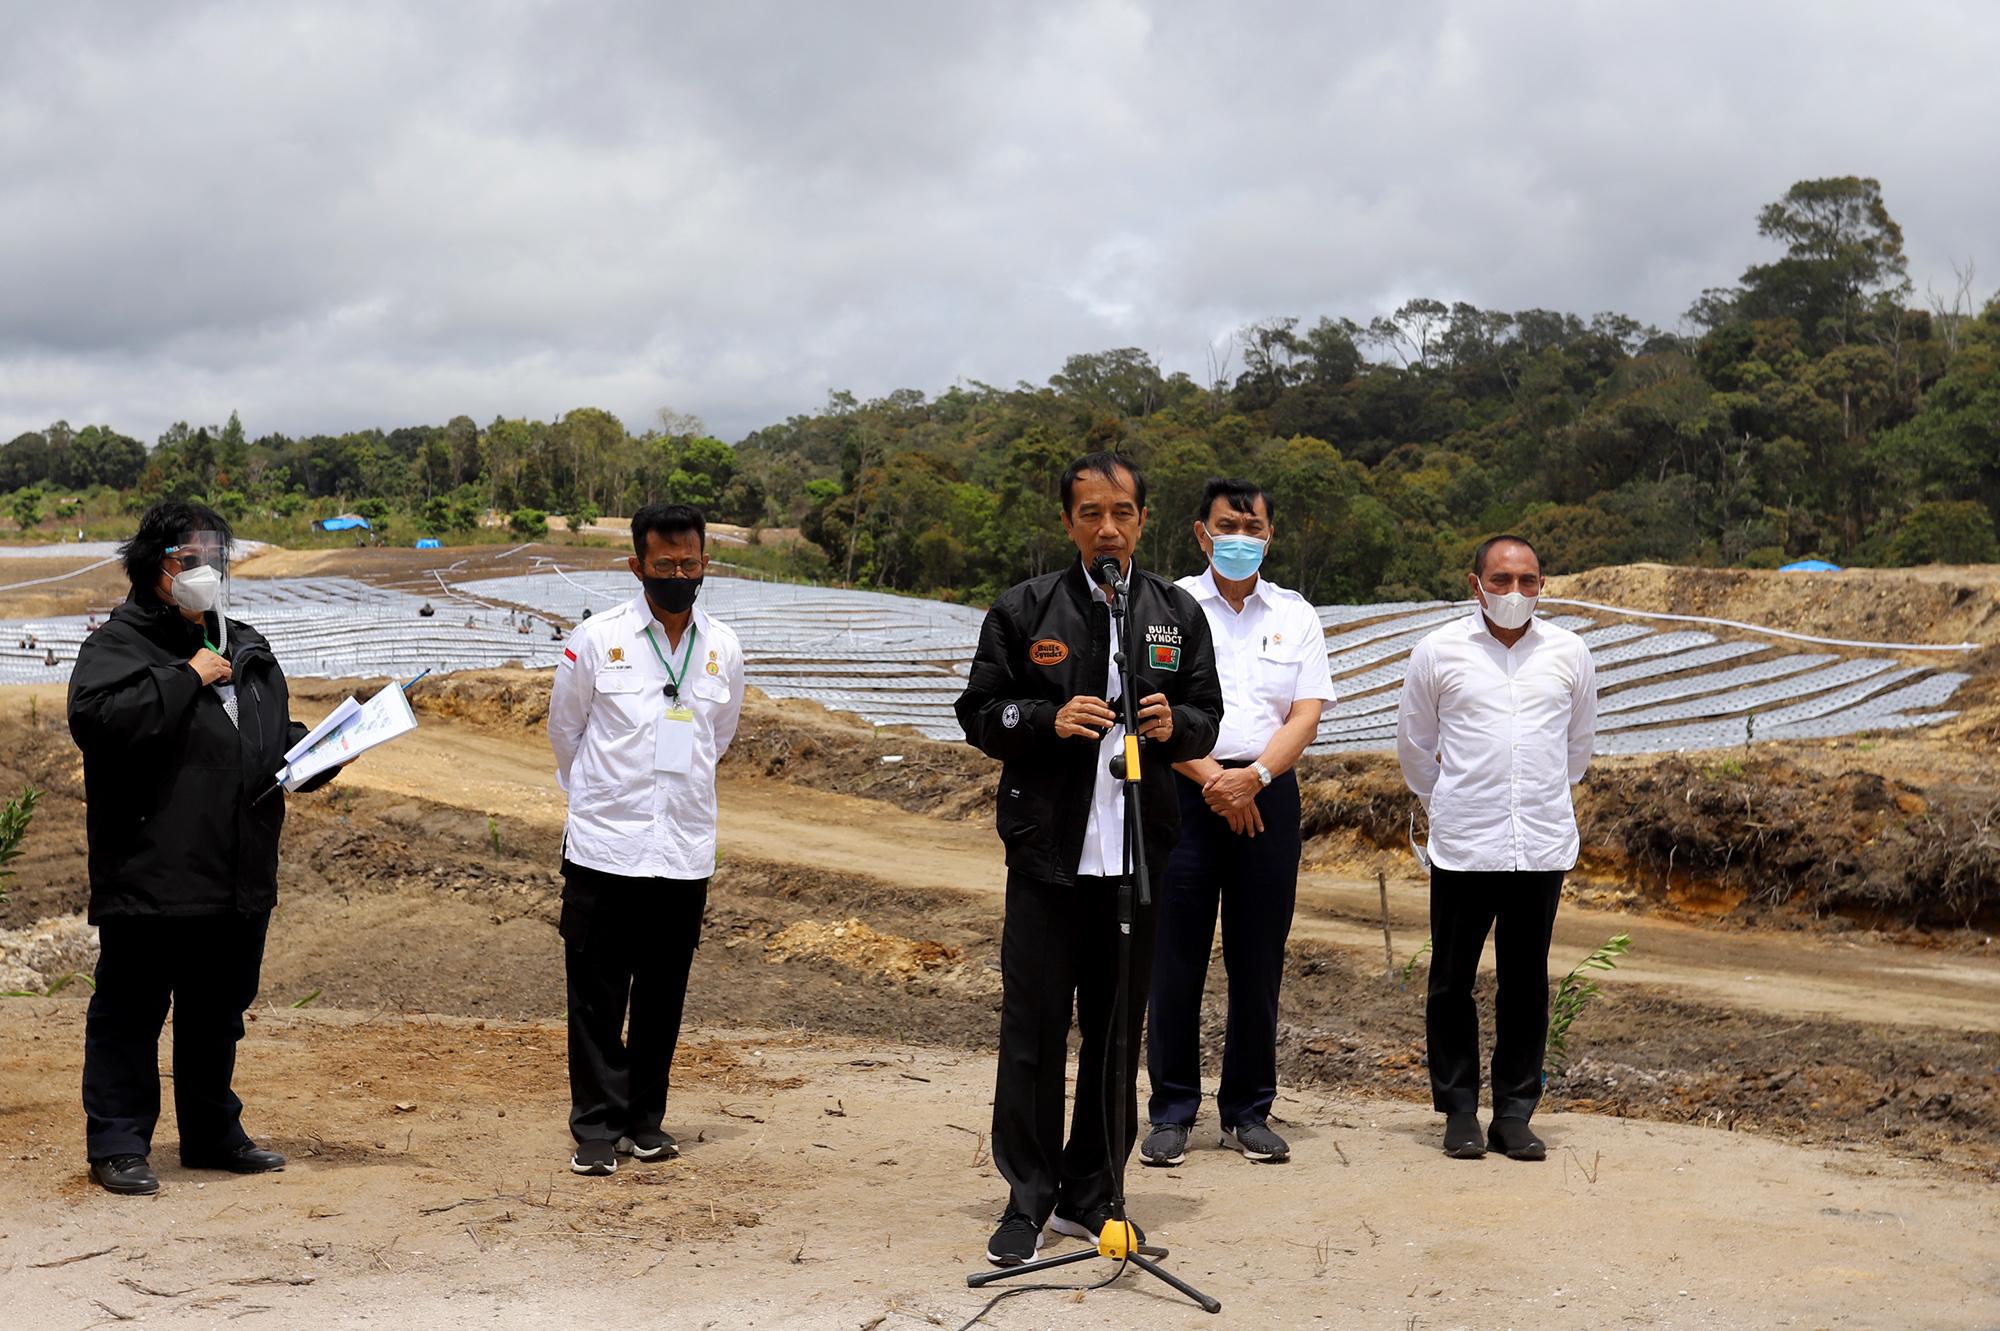 Tinjau di Humbahas, Presiden Jokowi Sebut30.000 Hektare untukKawasan Lumbung Pangan